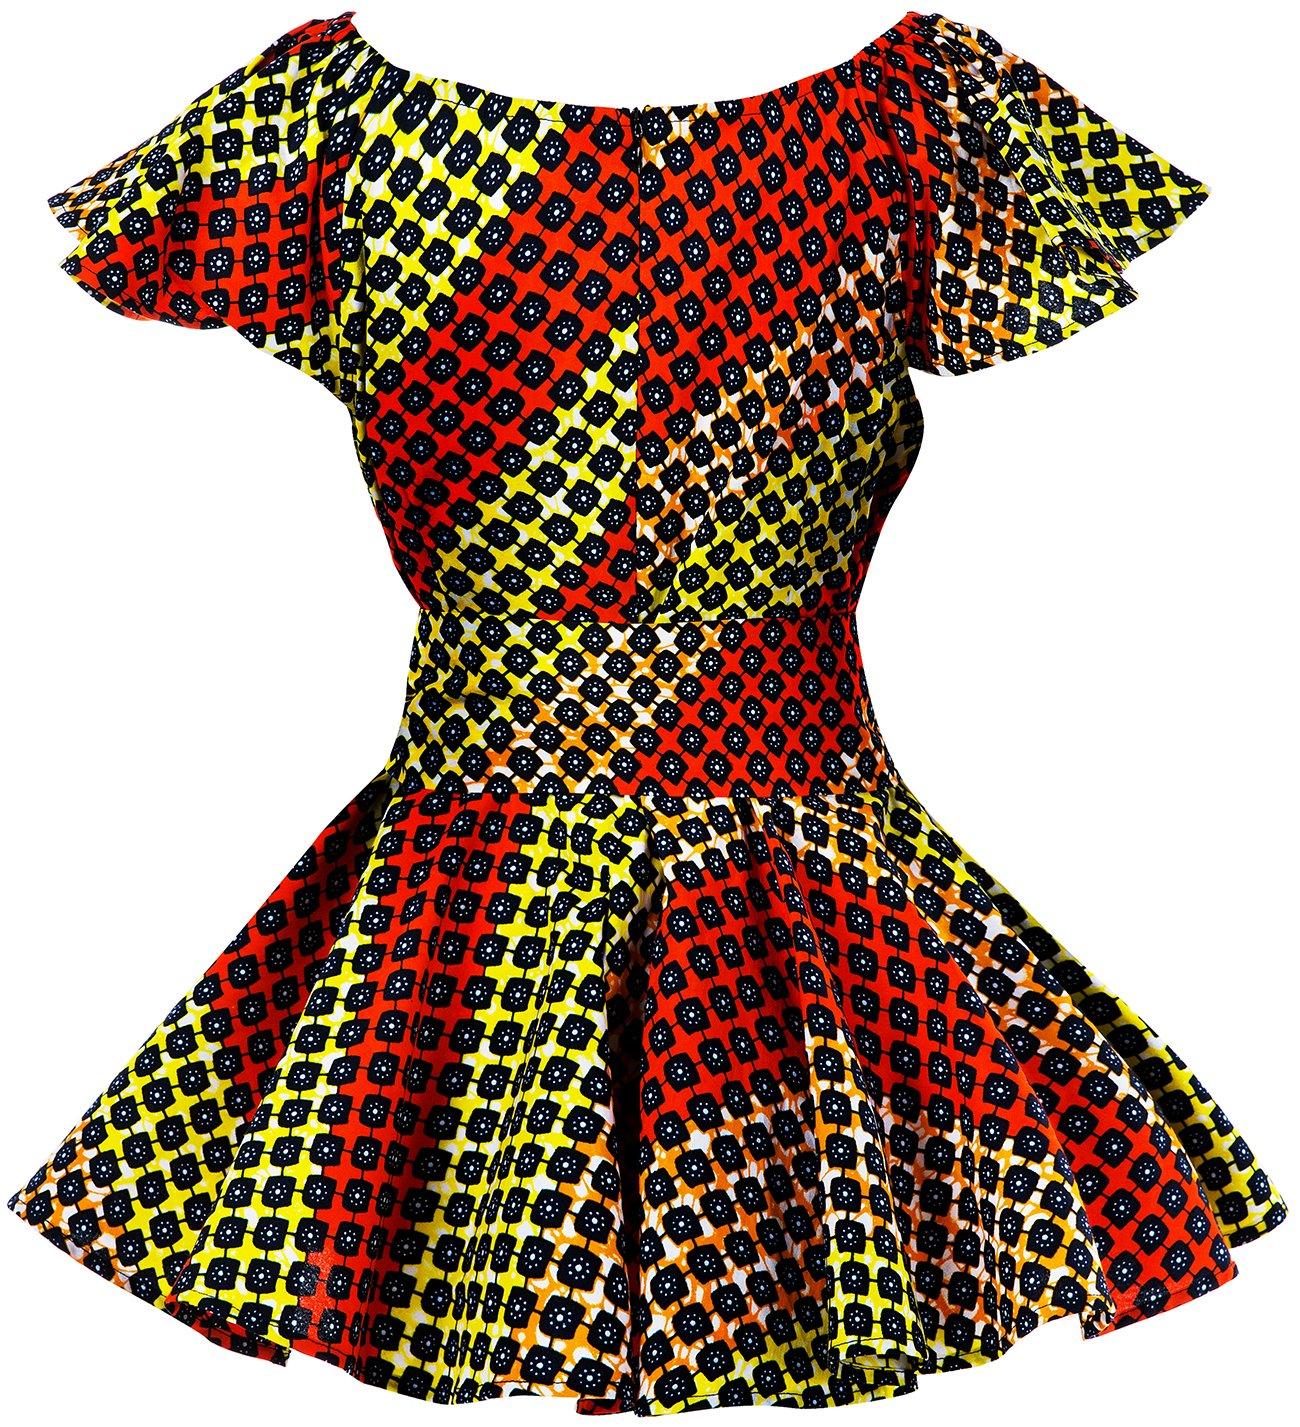 Shenbolen Womens Dashiki Tops Sleeveless Summer African Printed Slim Fit Shirts Blouse (Medium,B) by Shenbolen (Image #2)